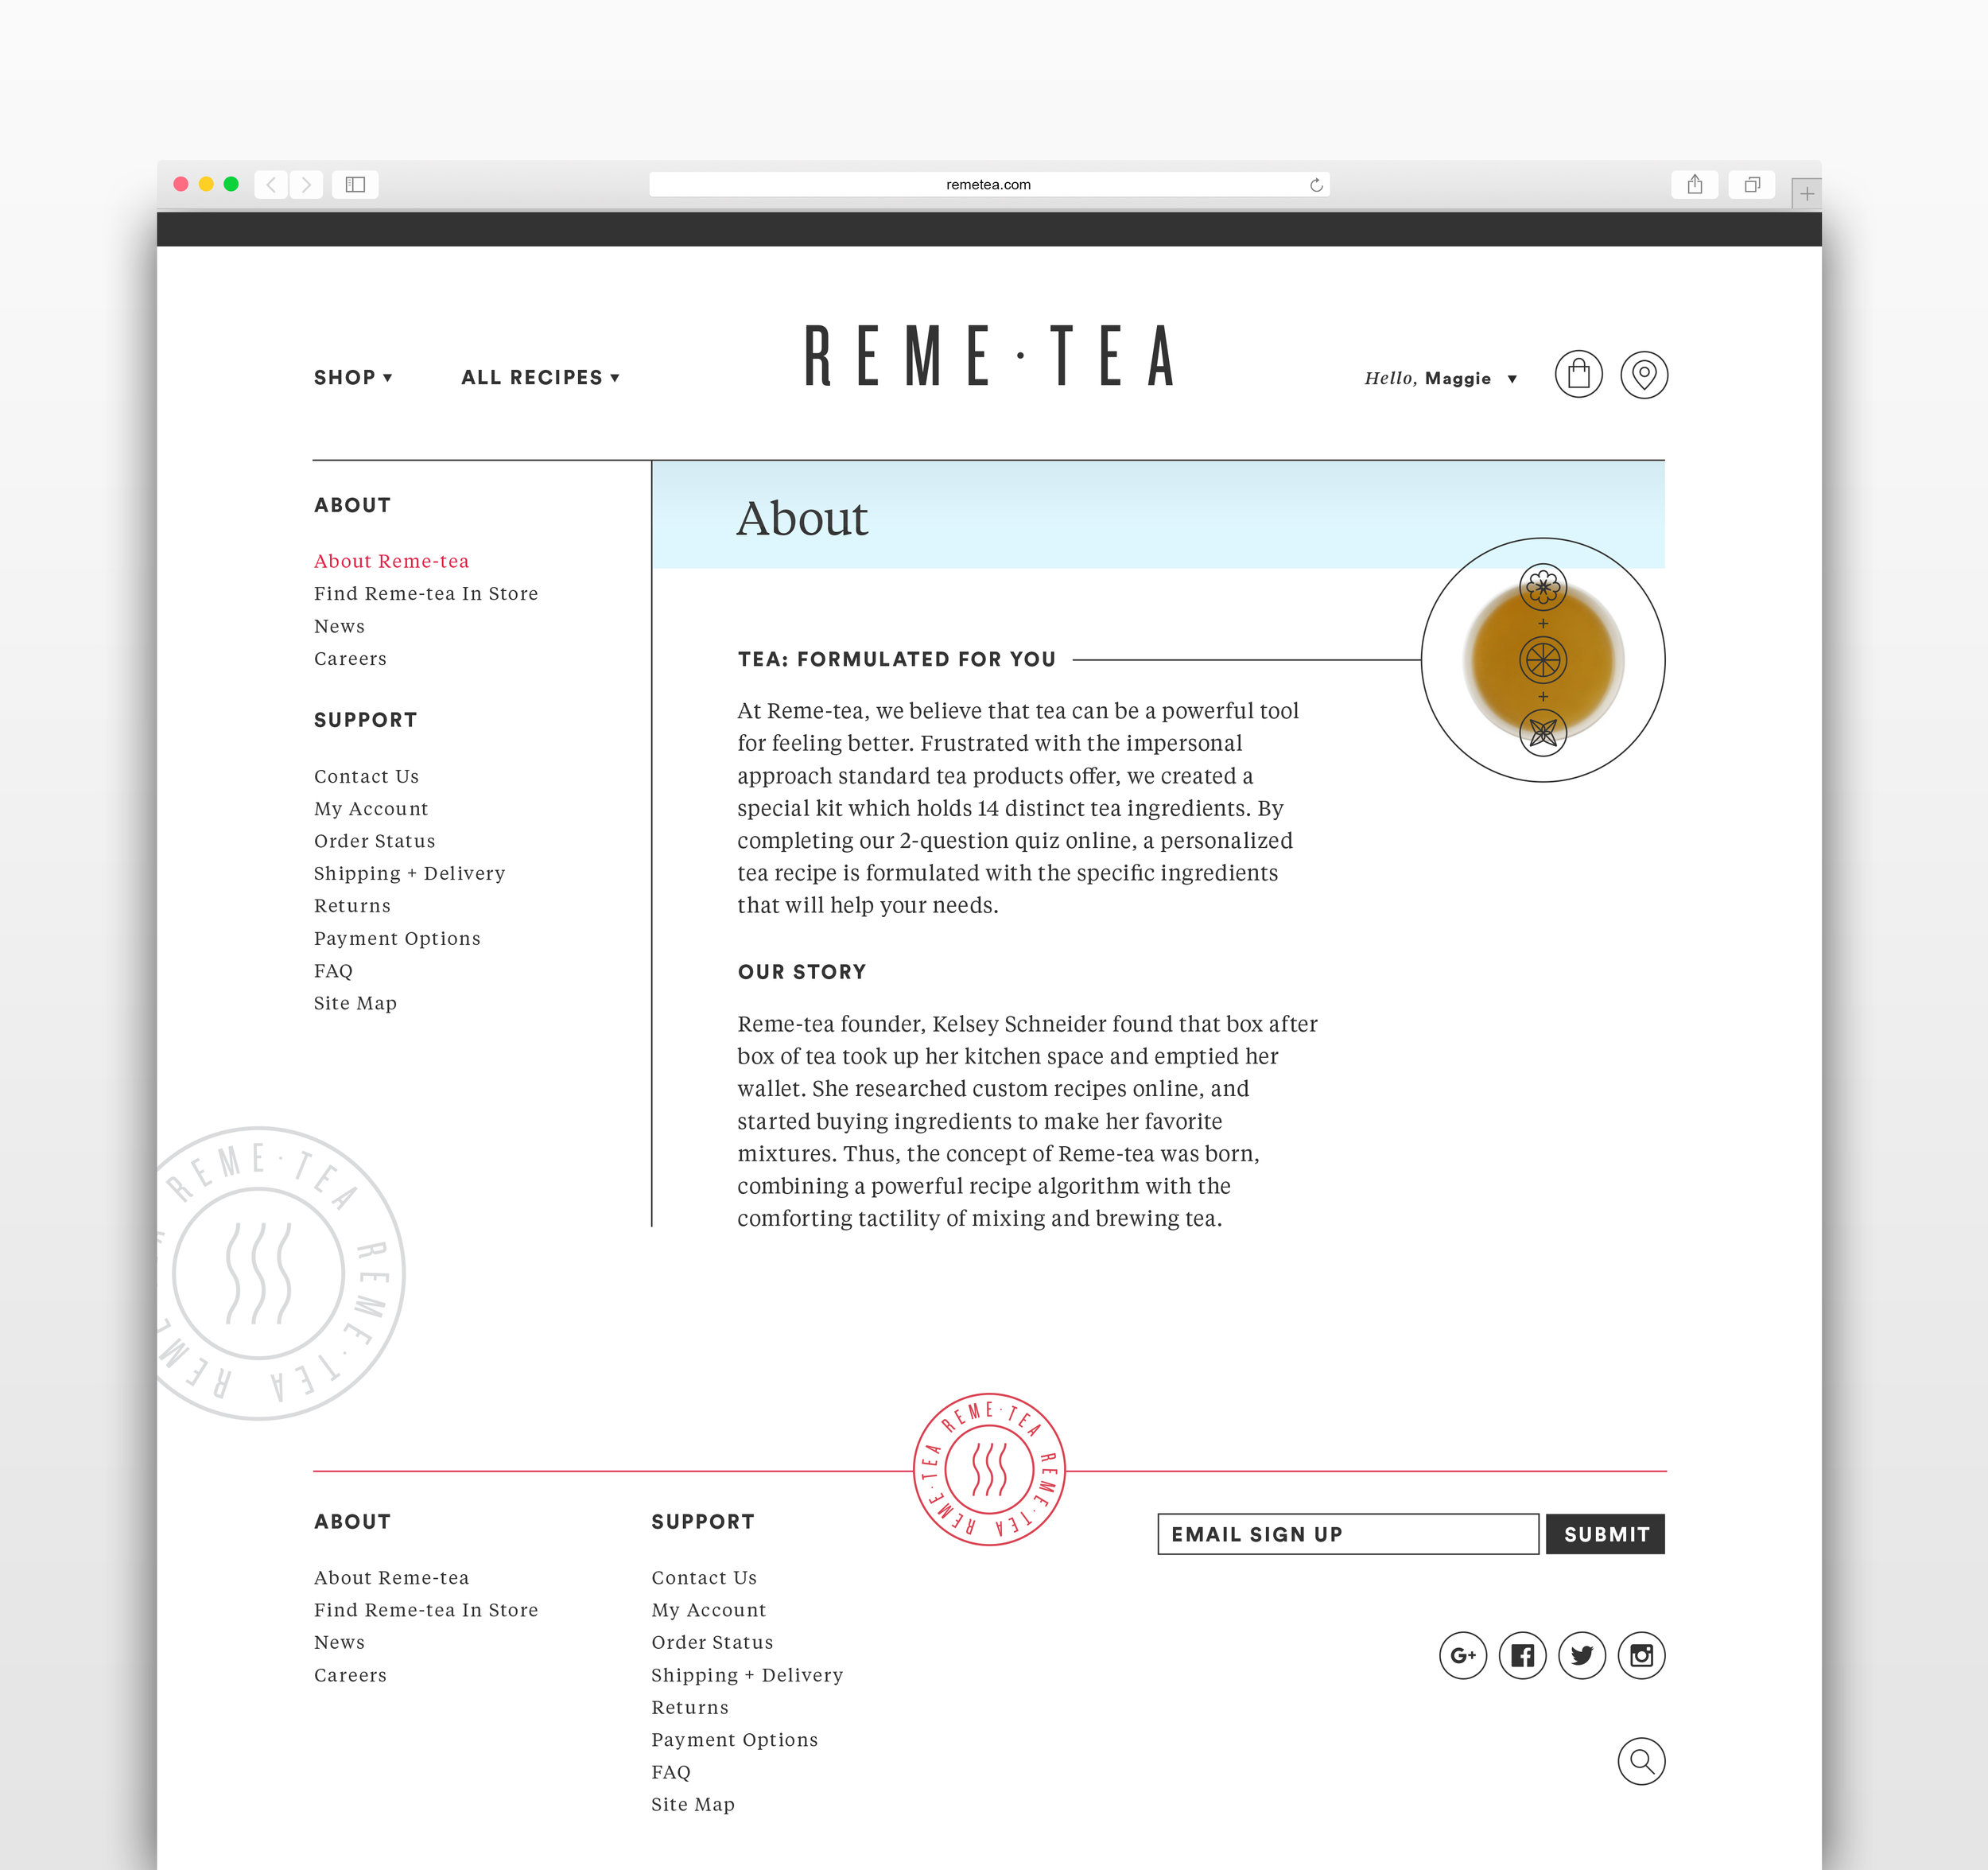 Remetea_Website_Mockup_5.jpg